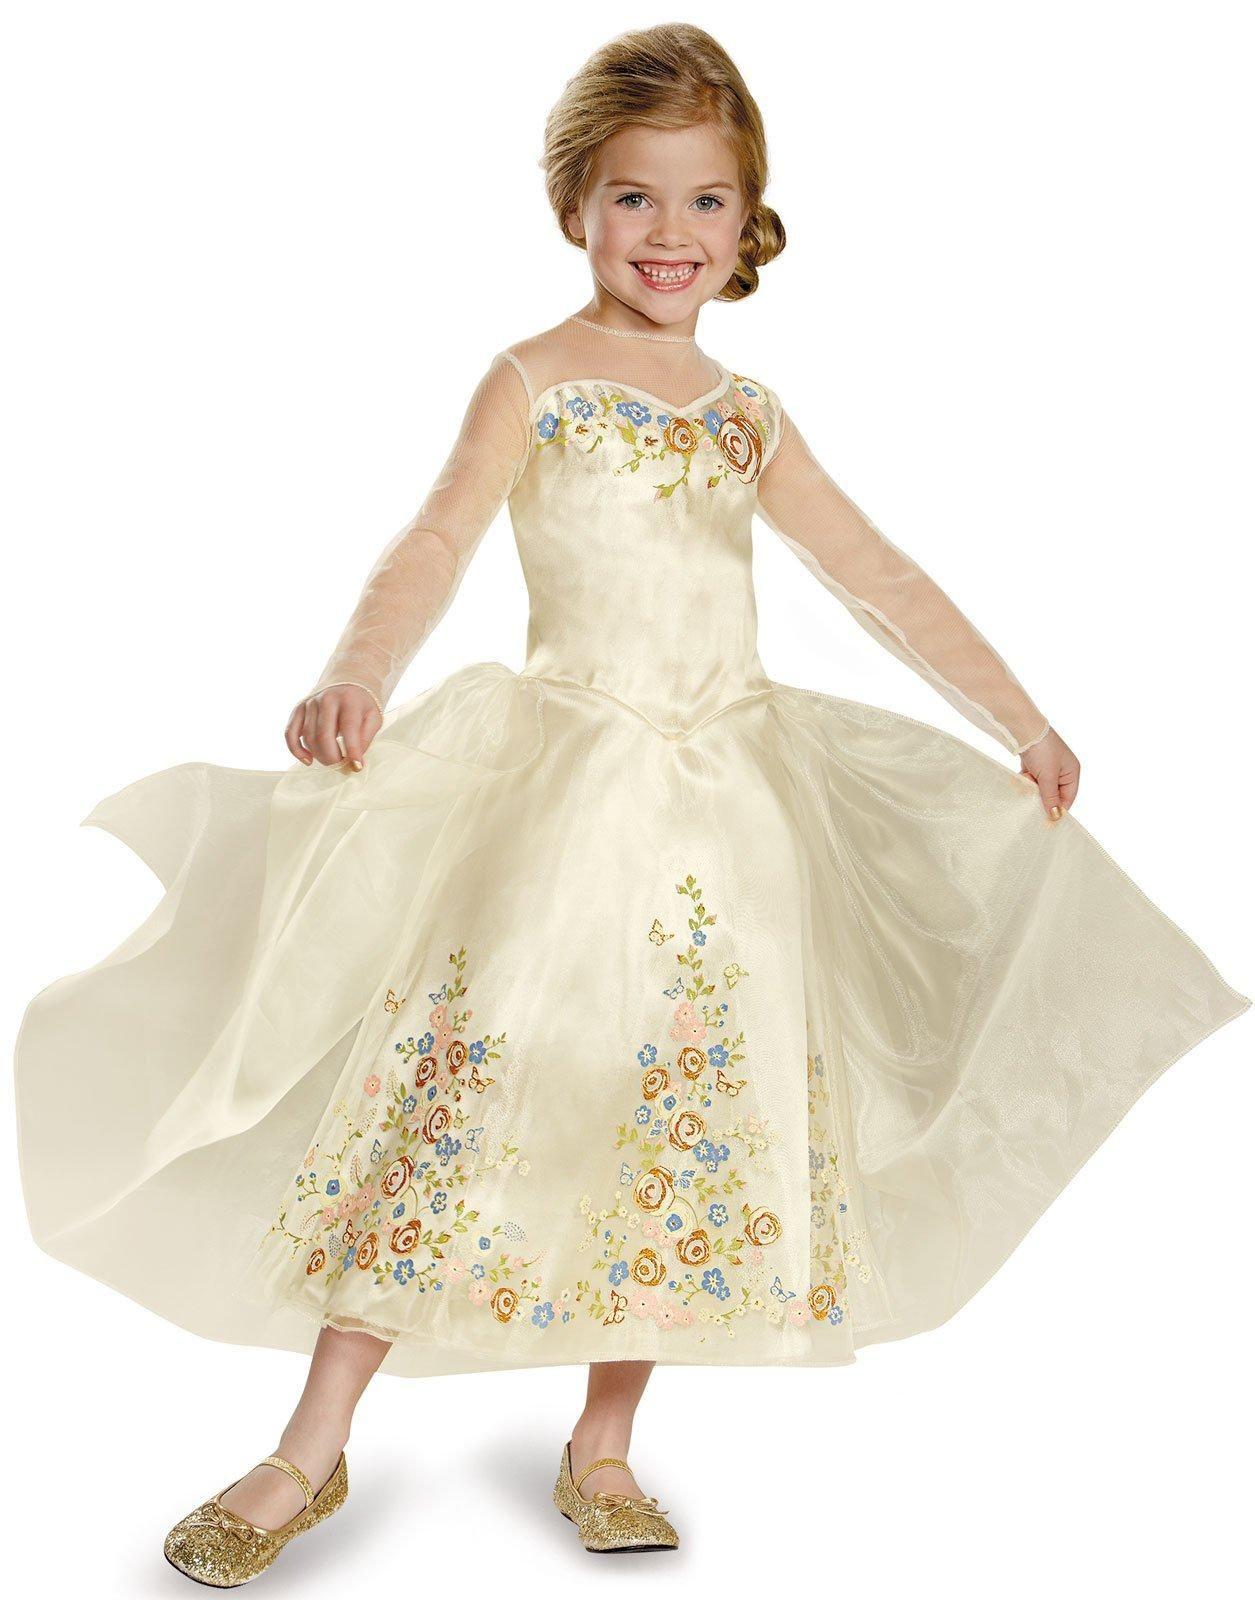 Disney Princess Cinderella Costume Dress Girls Size S 4-6X Dress Up NWT